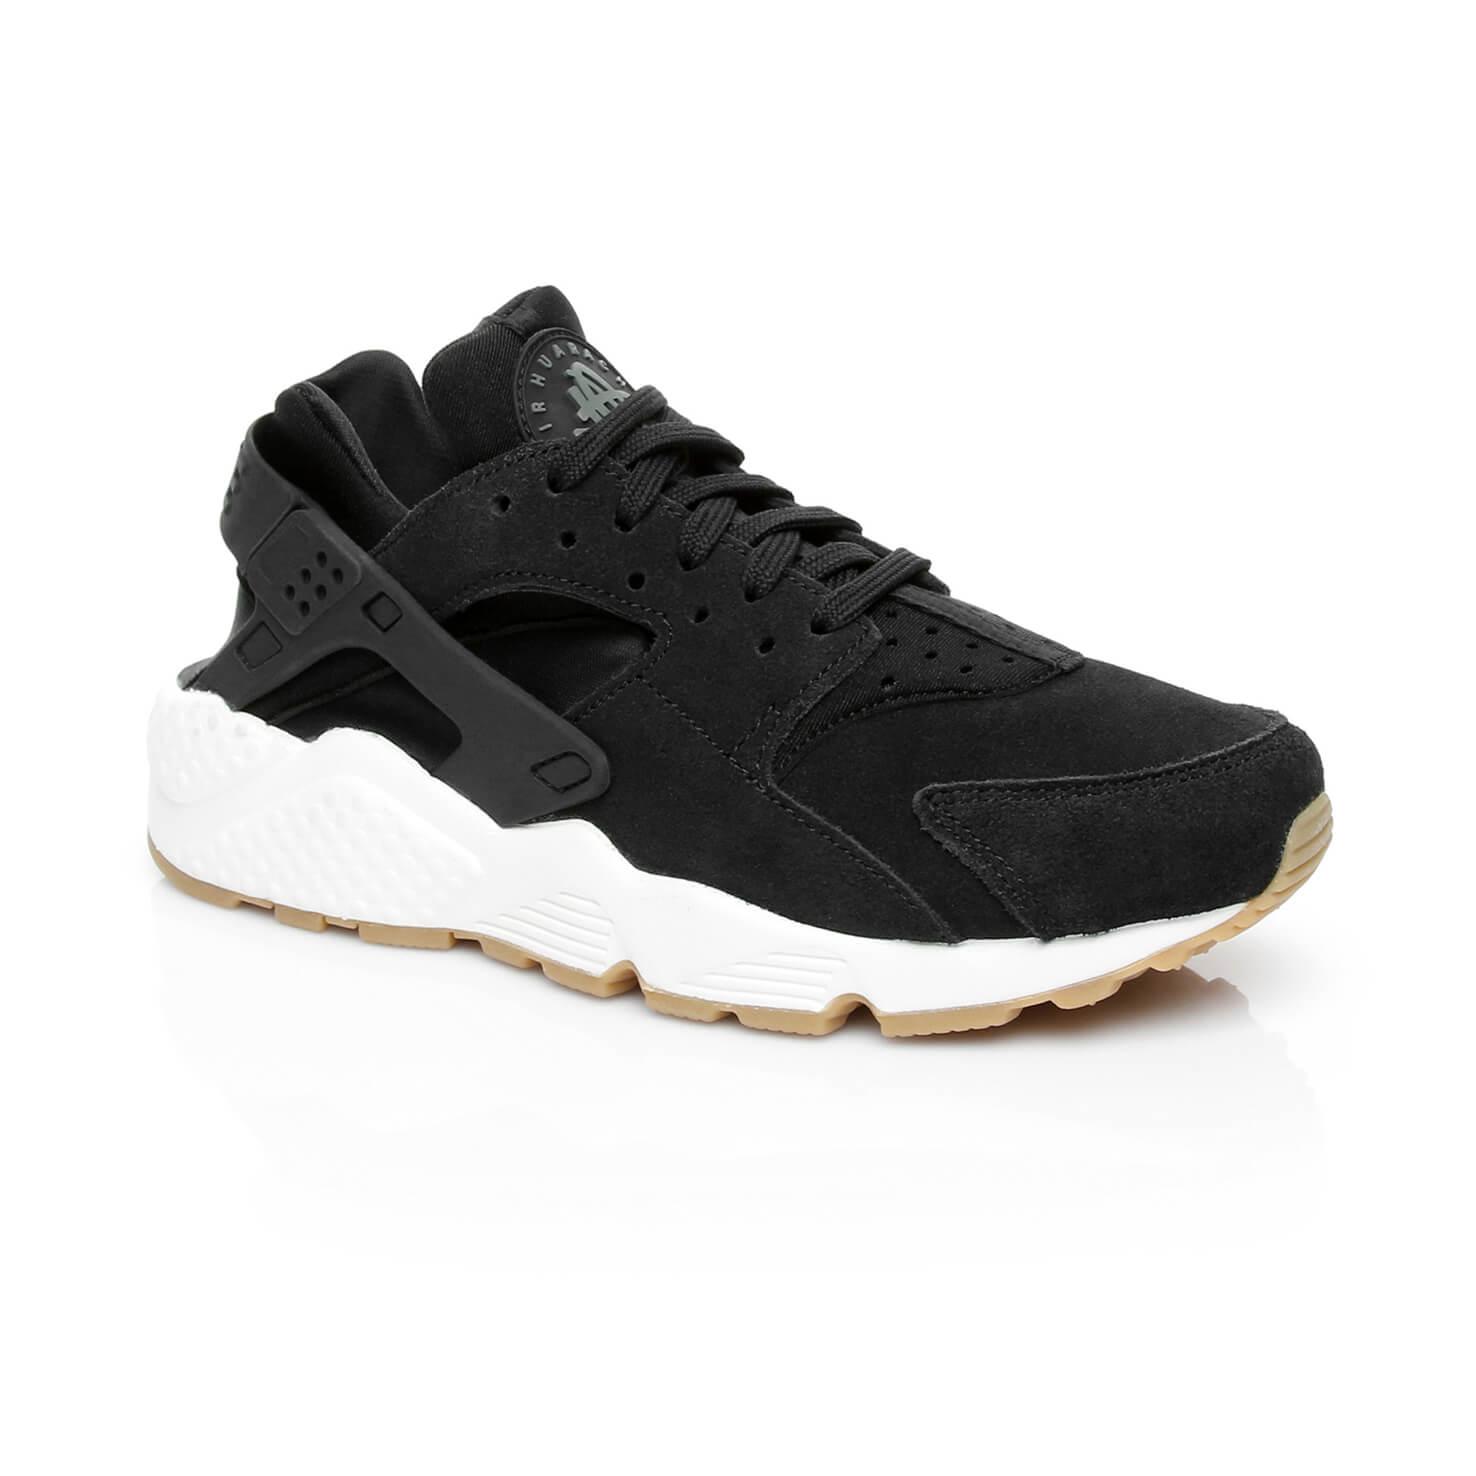 Nike Air Huarache Run SD Kadın Siyah Sneaker